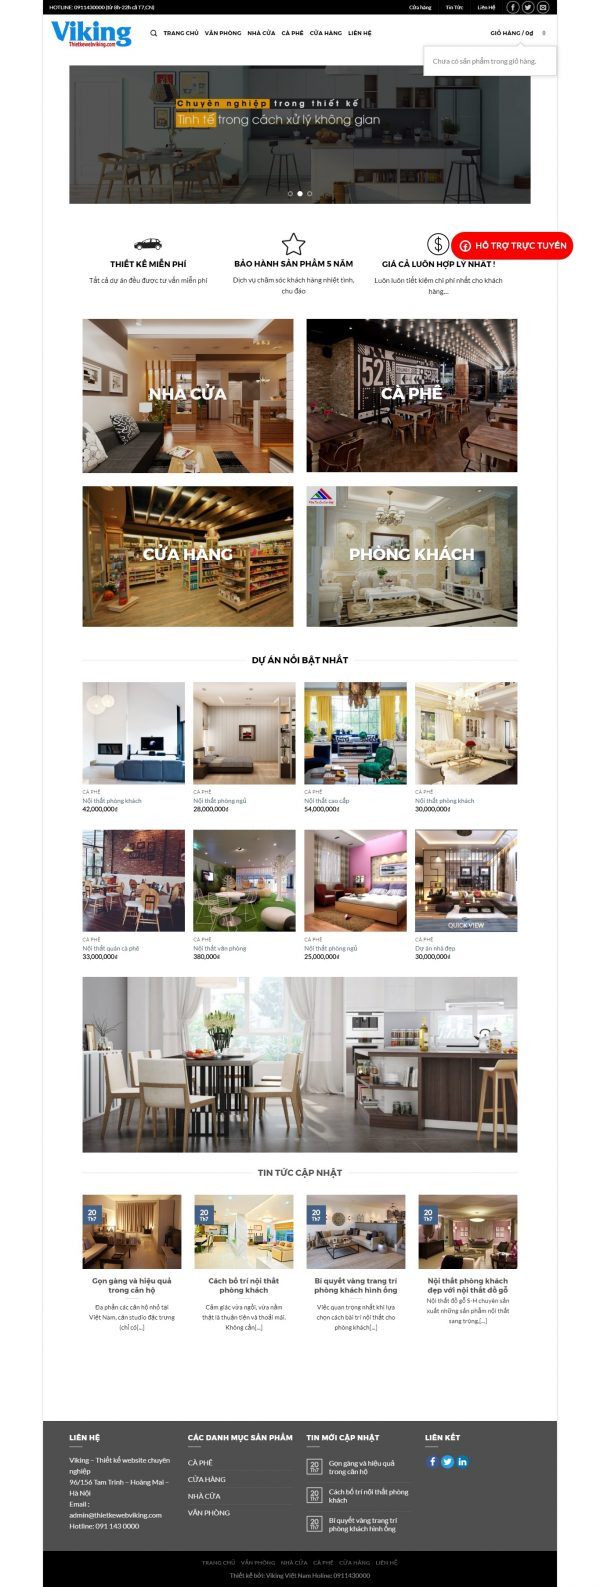 Thiết kế web nội thất mẫu 5